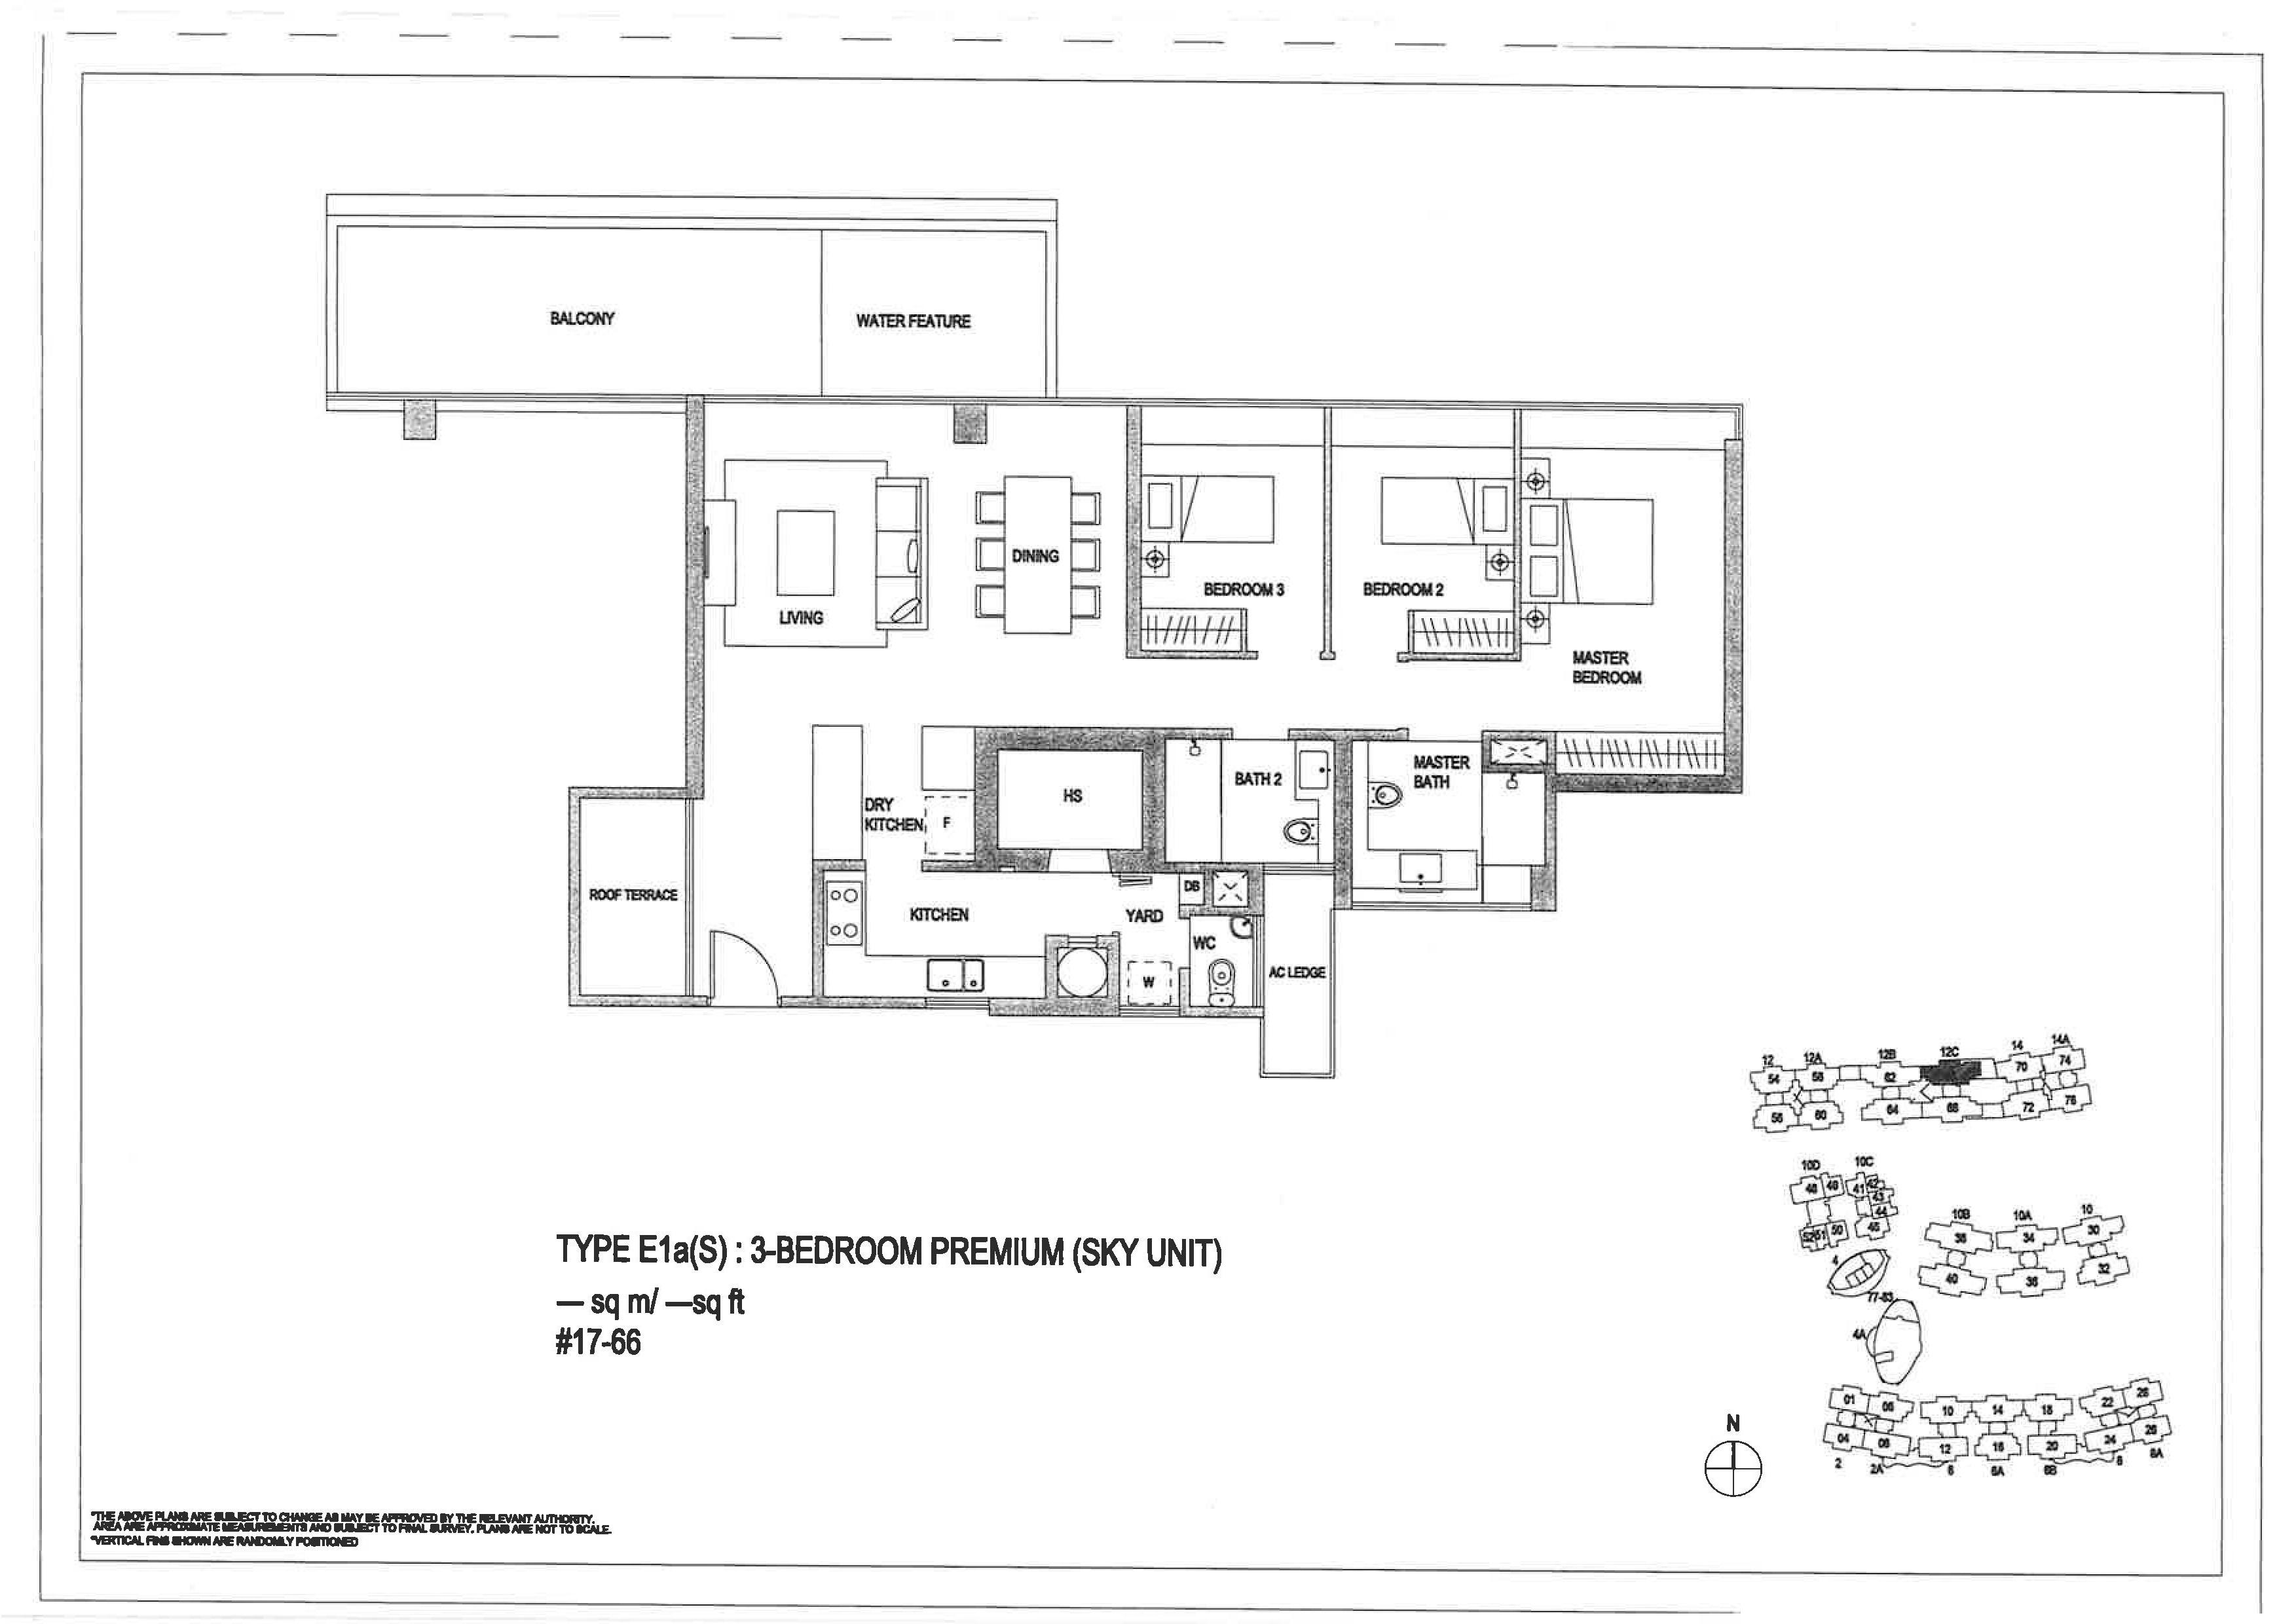 The Minton 3 Bedroom Premium Floor Plans Type E1a(S)